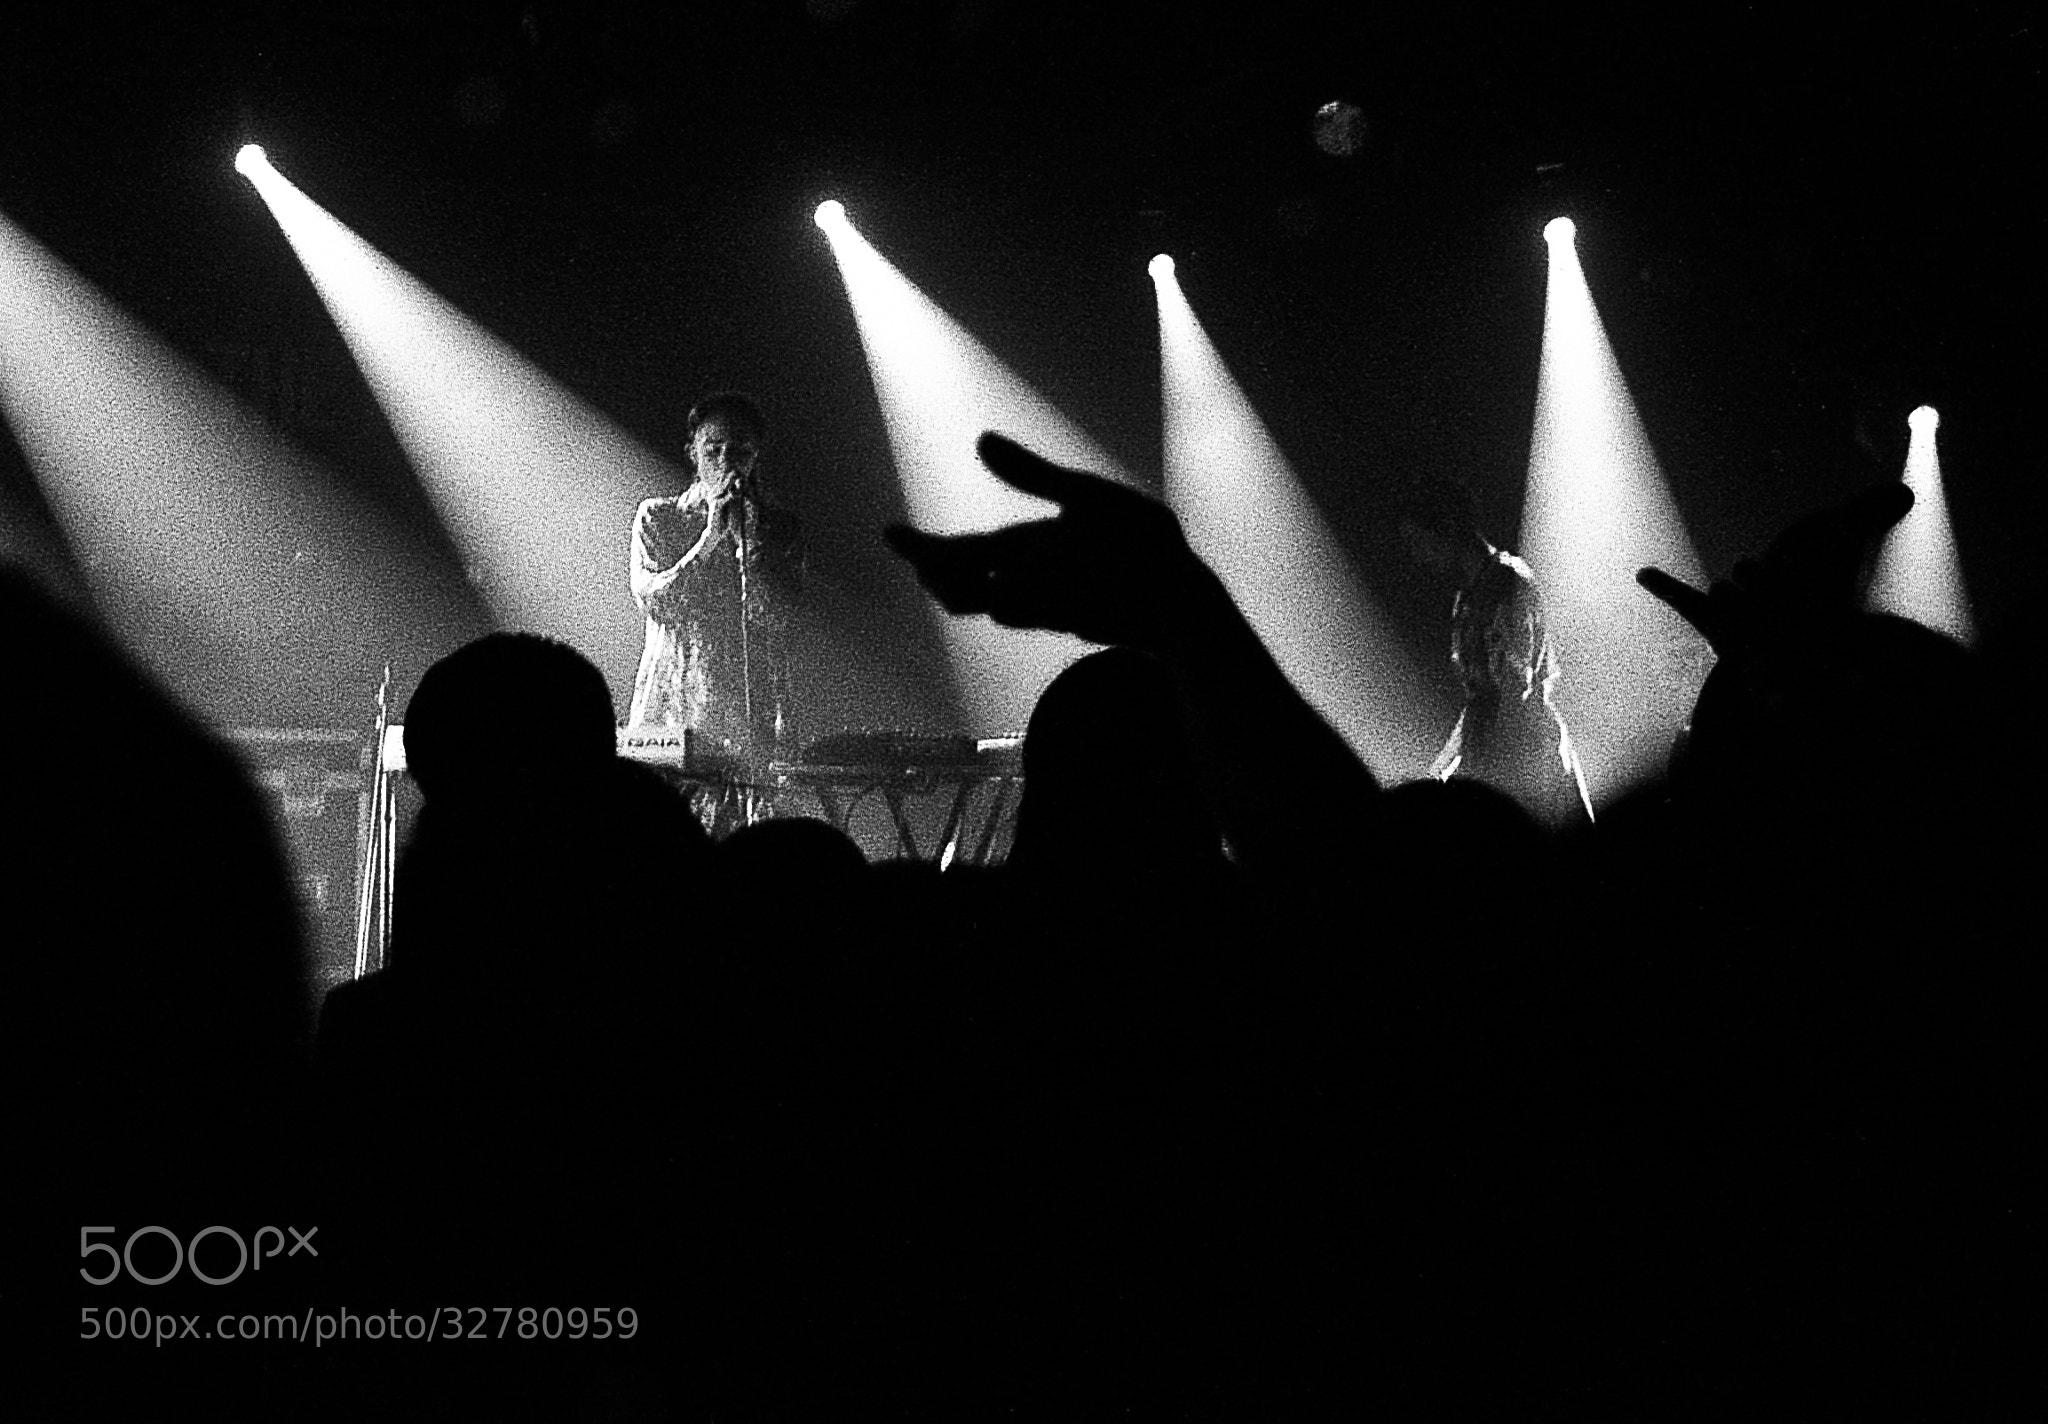 Photograph Grimes Taipei Concert by Lin Chun Yao on 500px